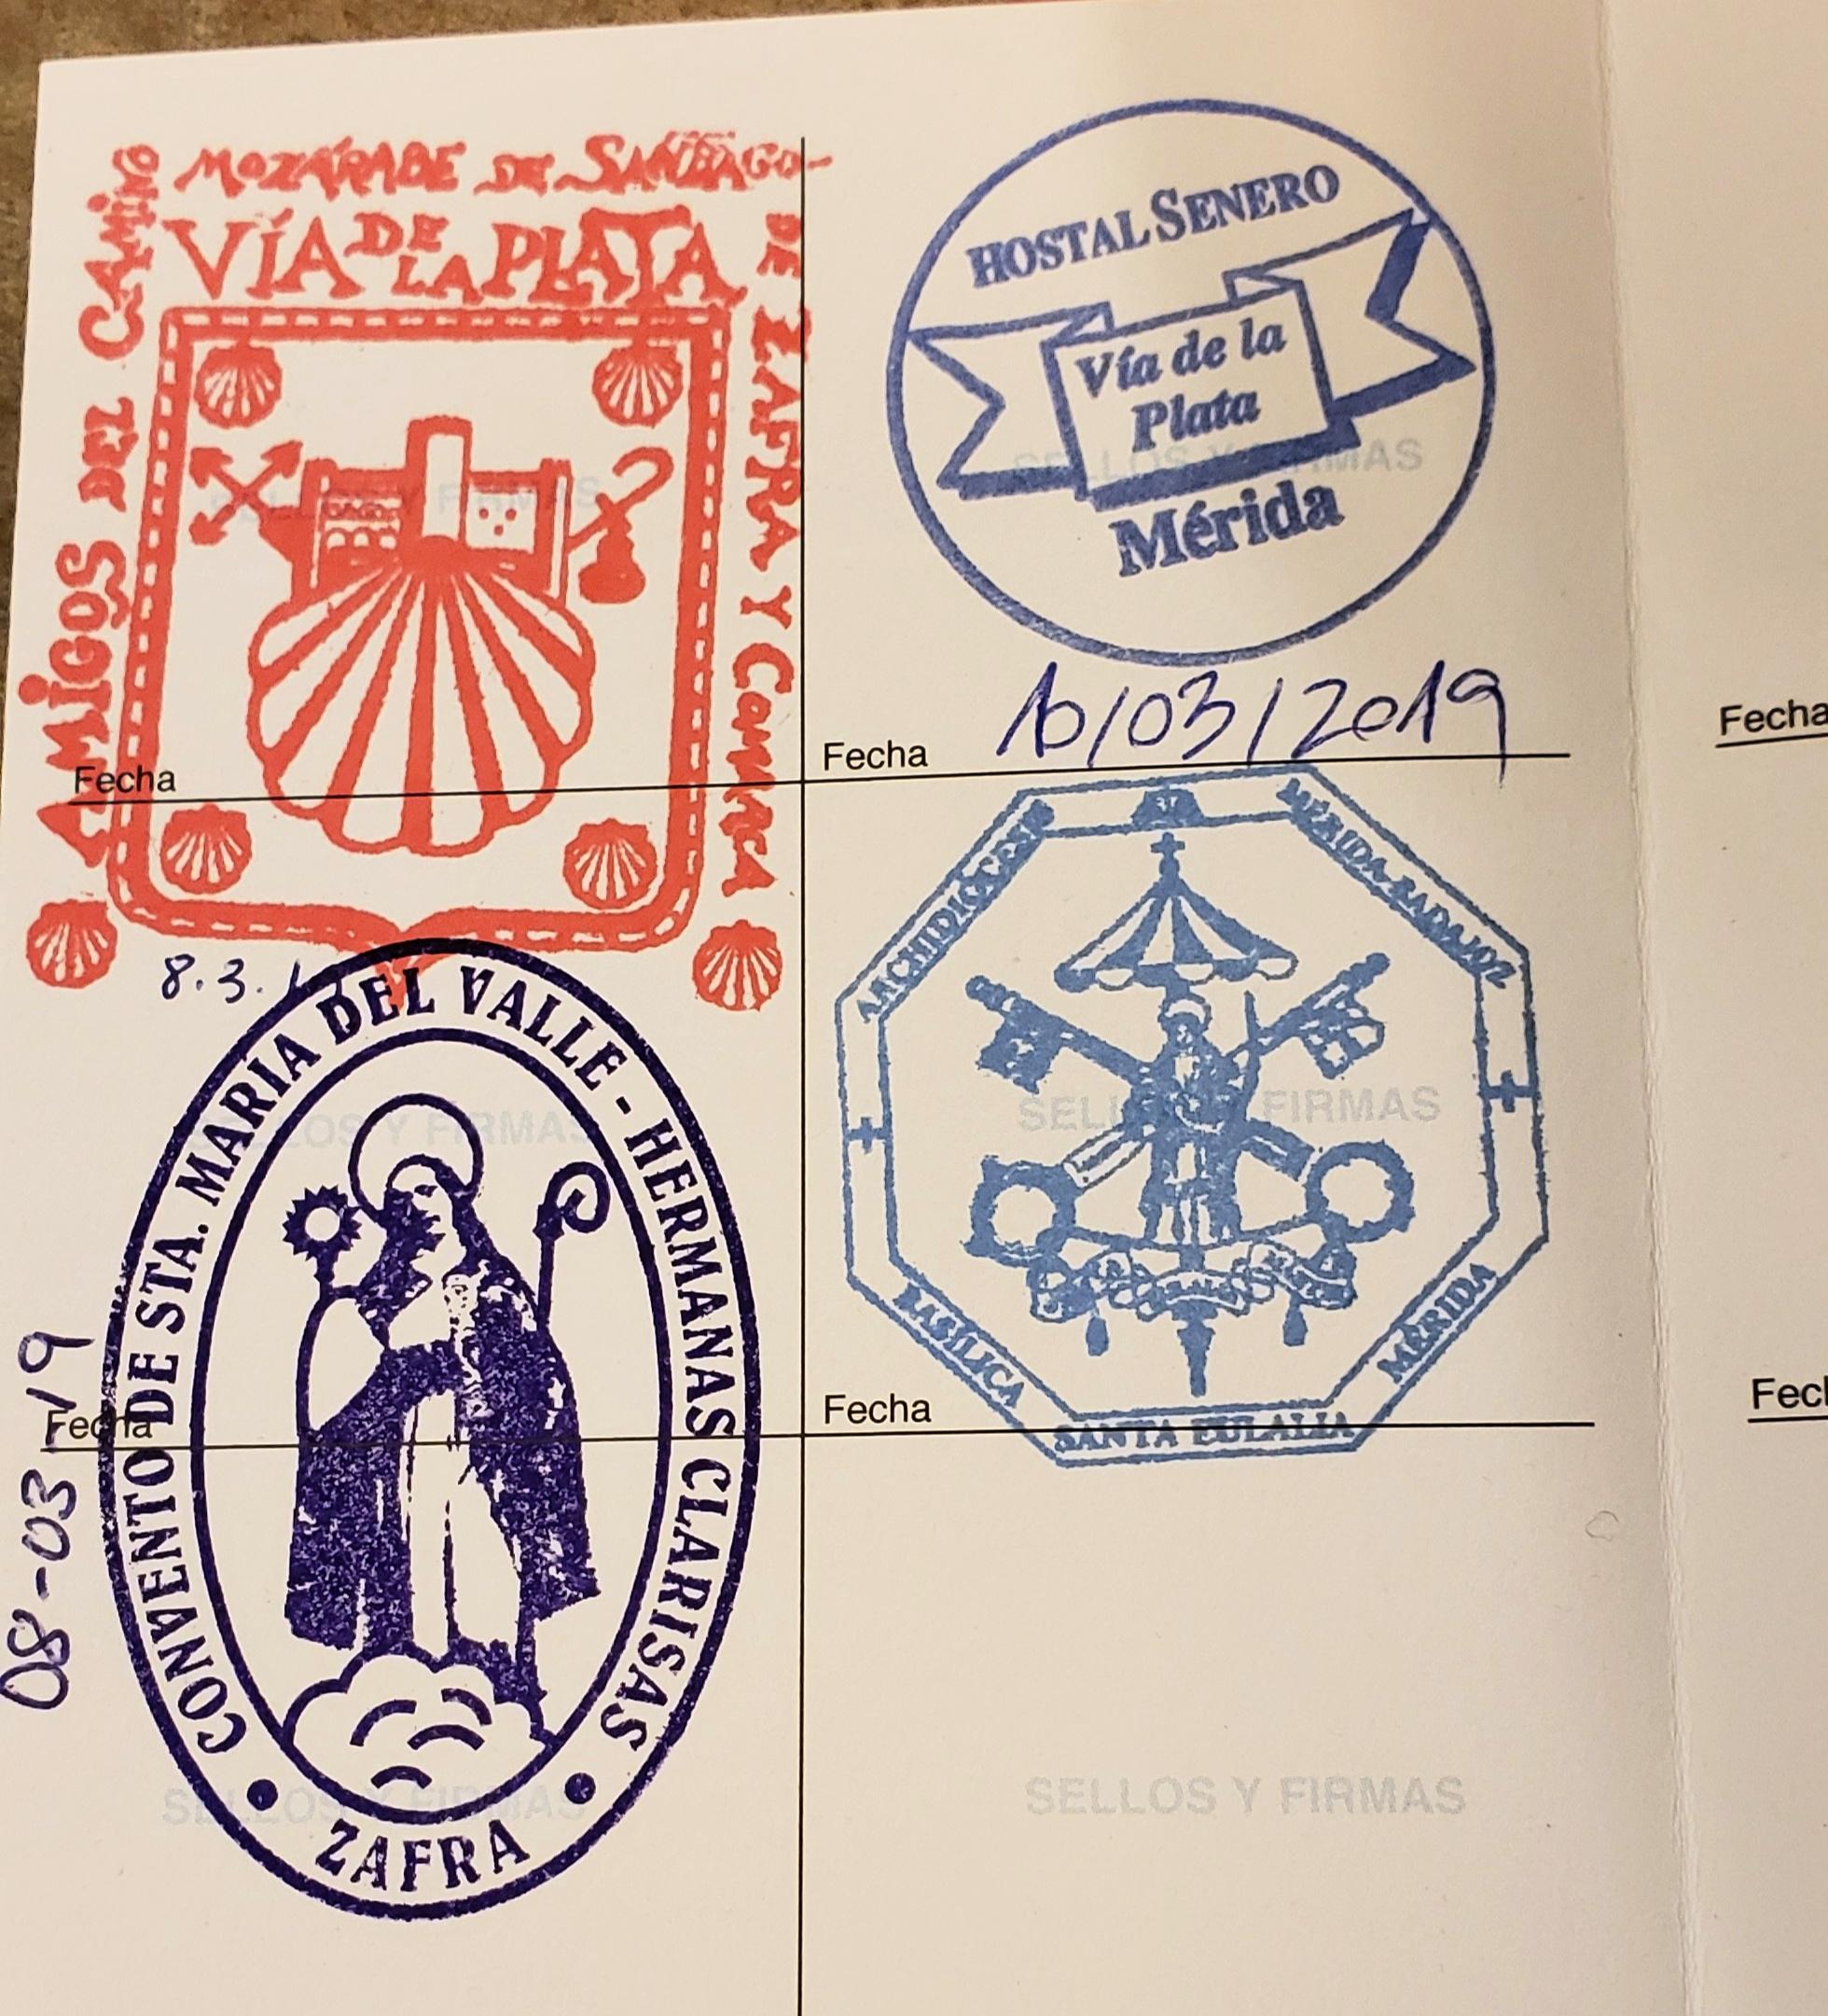 L2F Jul 20 pic Spain Way of St James pilgrim stamps